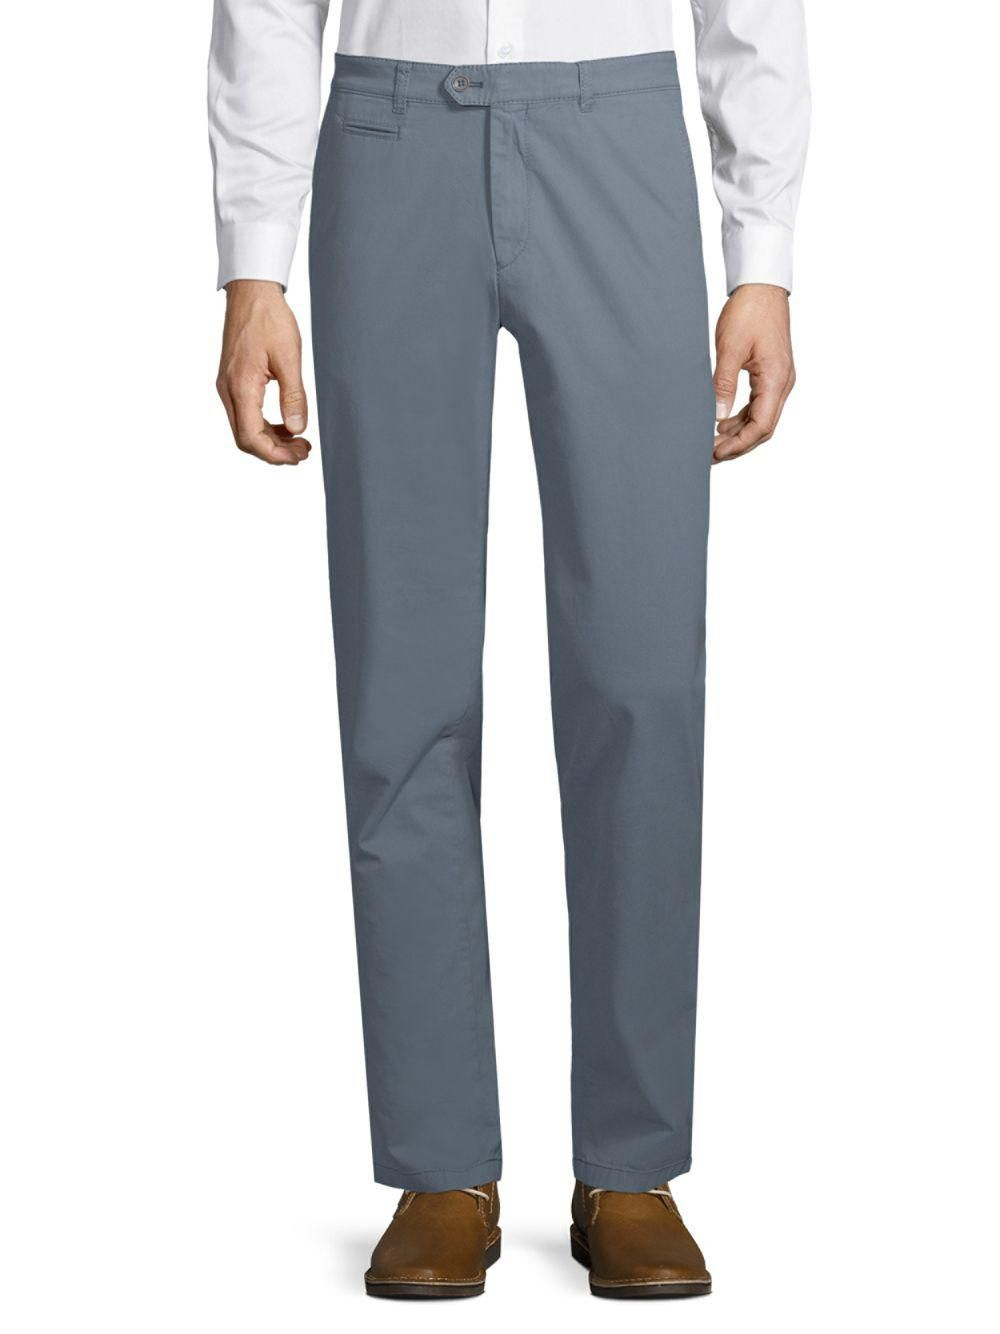 süß billig klar in Sicht baby BRAX CHINO FOR MEN – Elegant casual pants for men's wardrobe